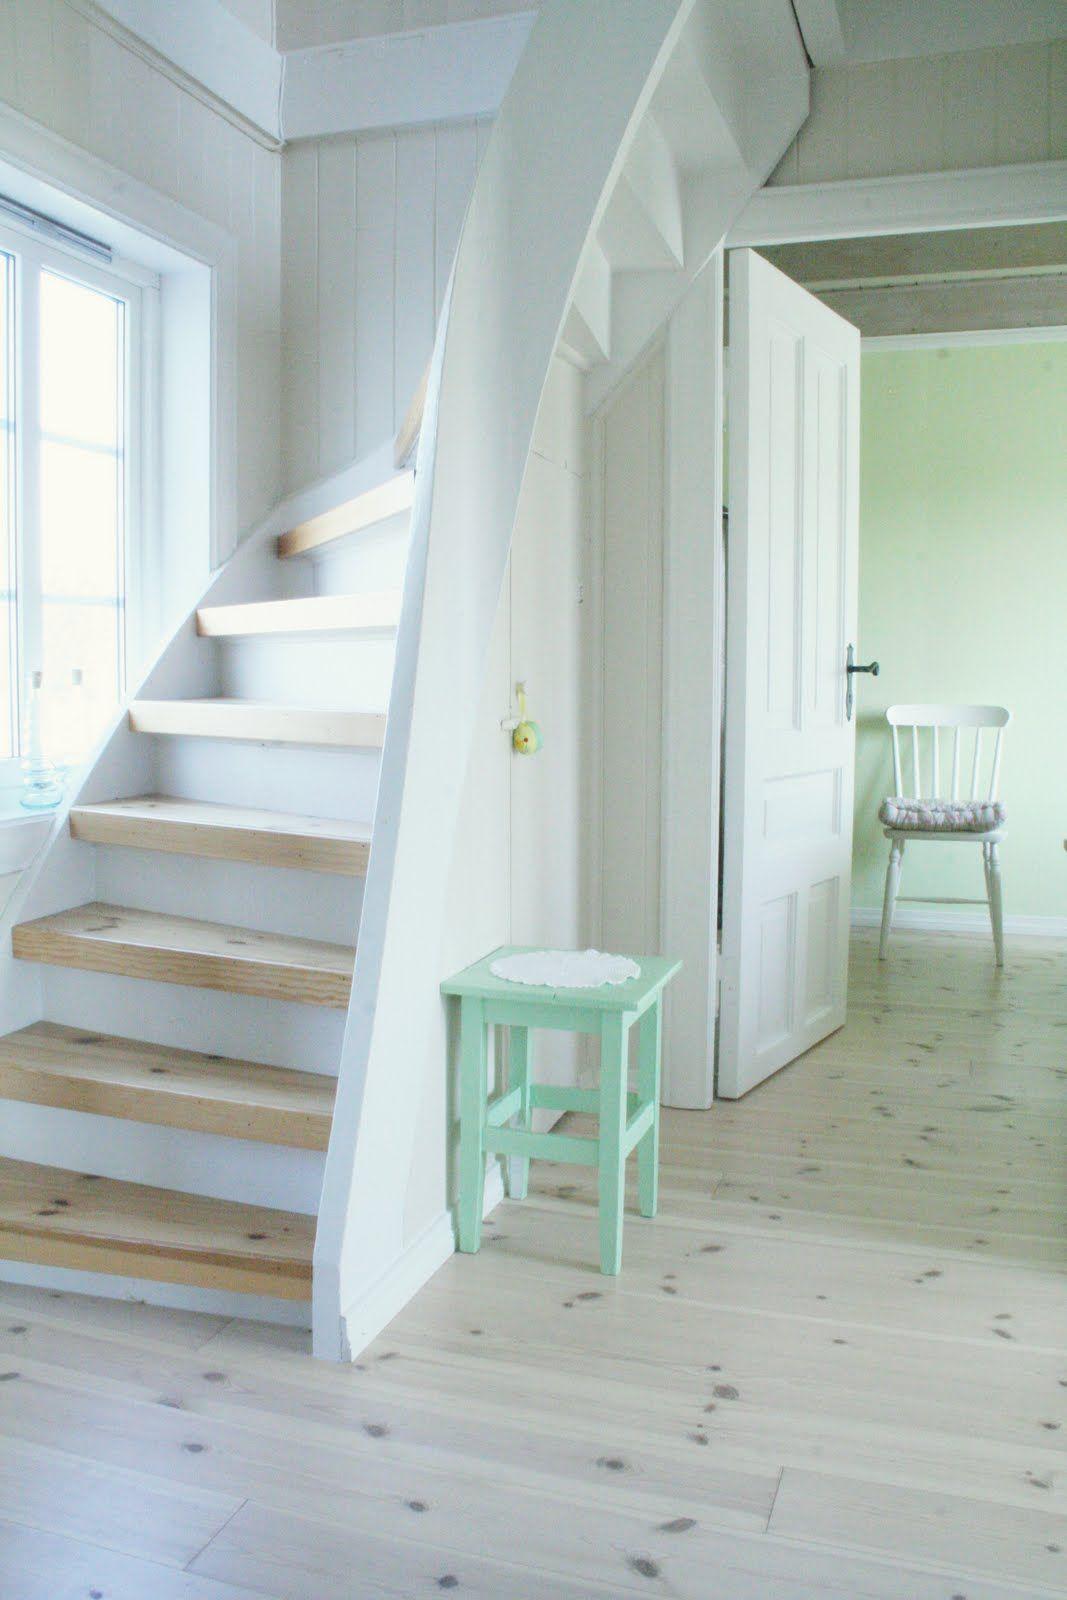 Best Curving Staircase In A Tight Spot Furniture Pøbel A 400 x 300